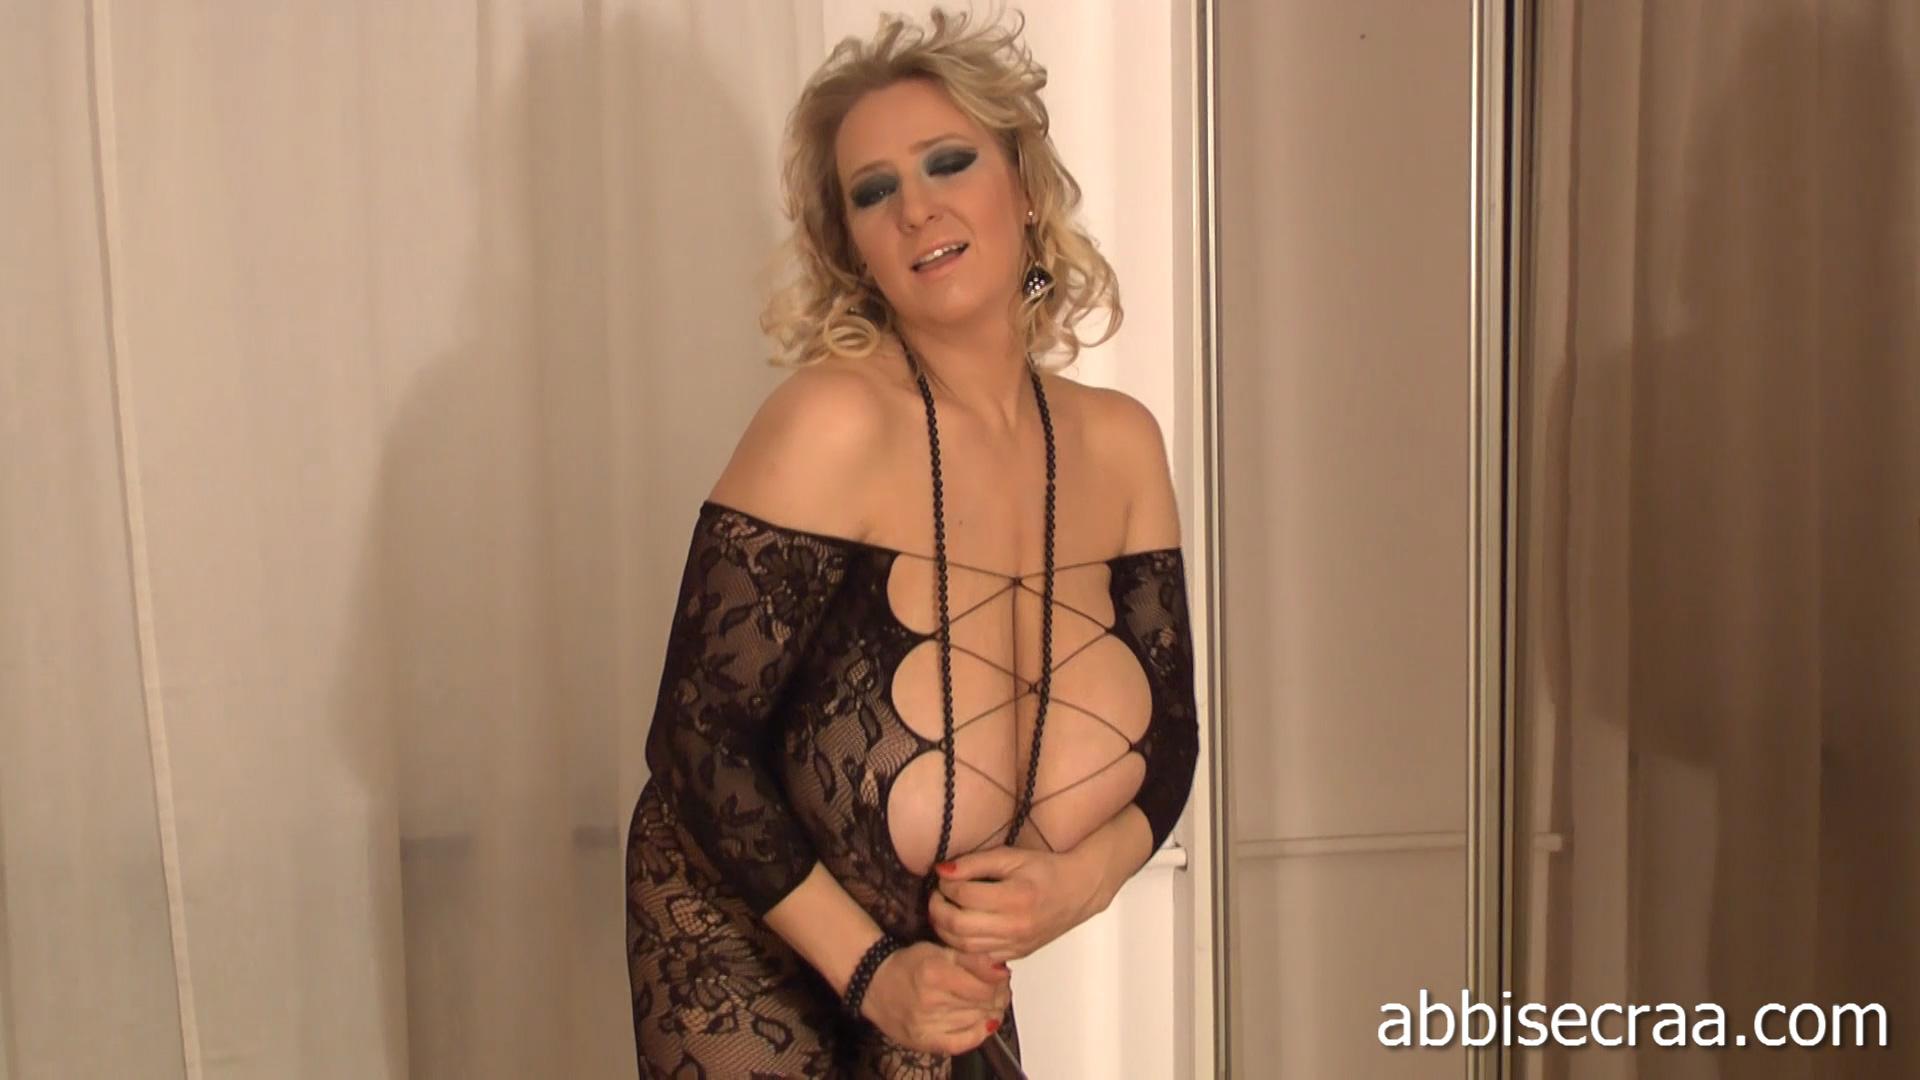 Abbi secraa videos